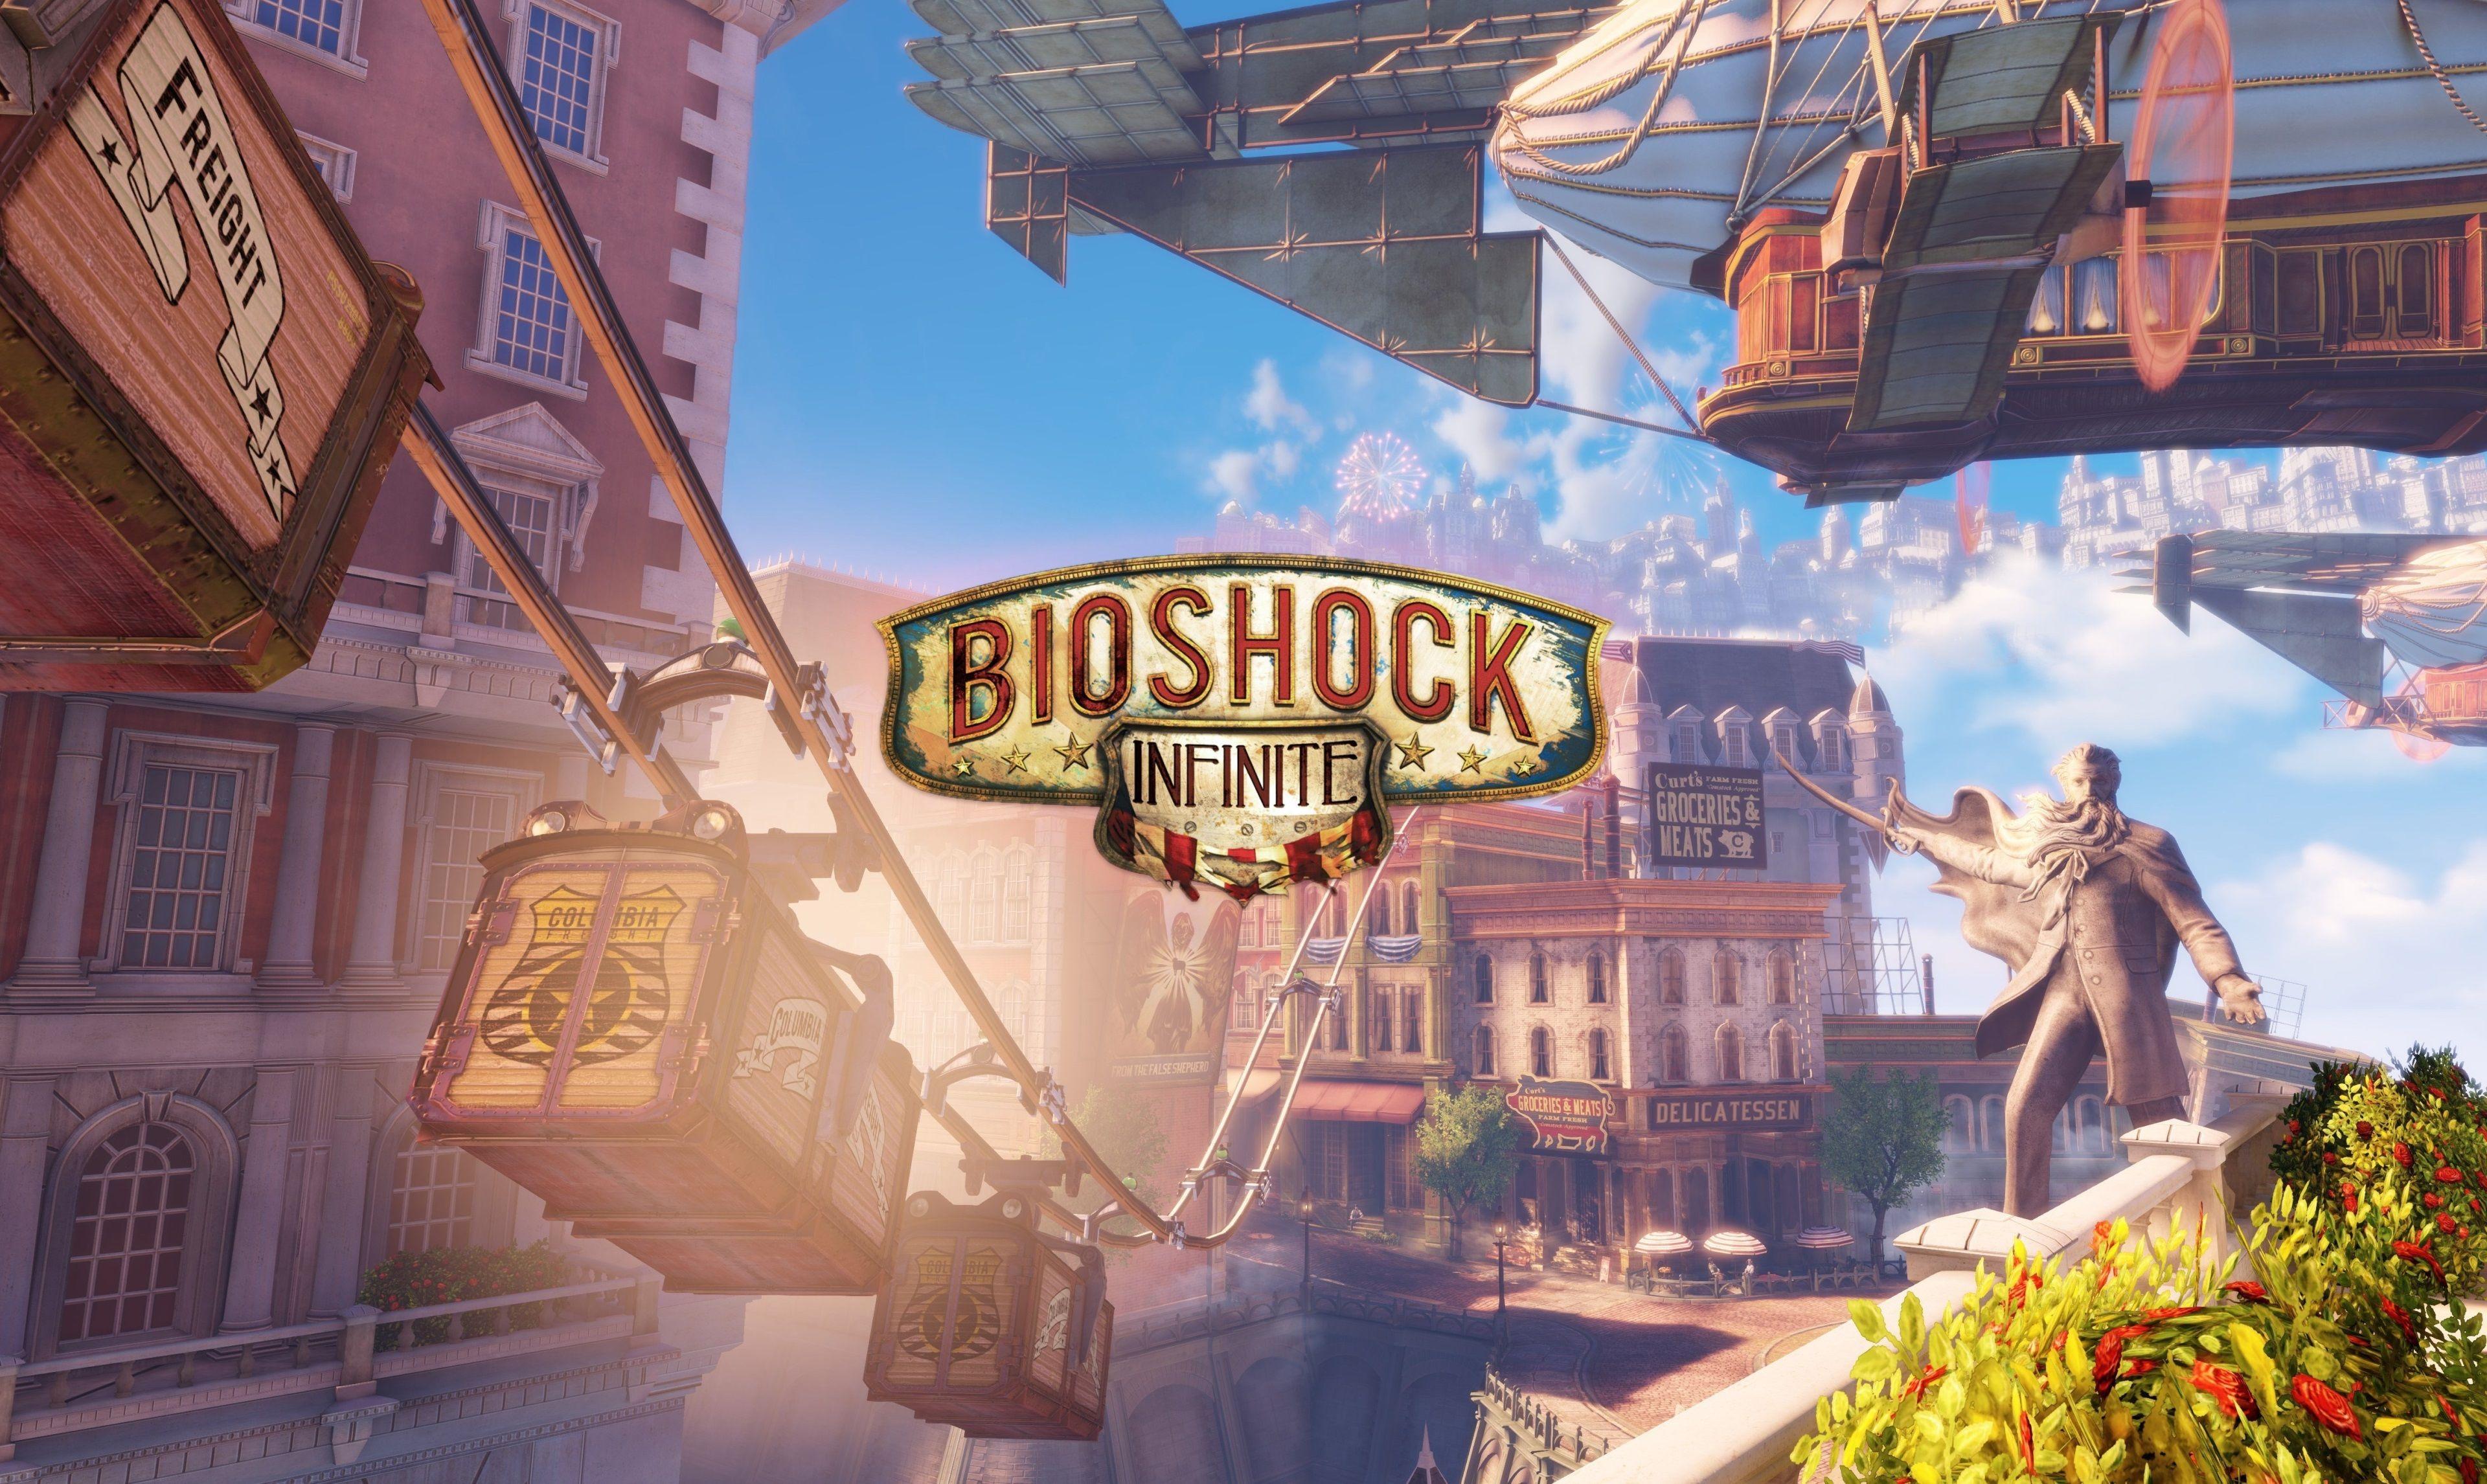 3840x2292 Bioshock Infinite 4k Free Wallpaper Background Bioshock Bioshock Infinite Pc Games Wallpapers